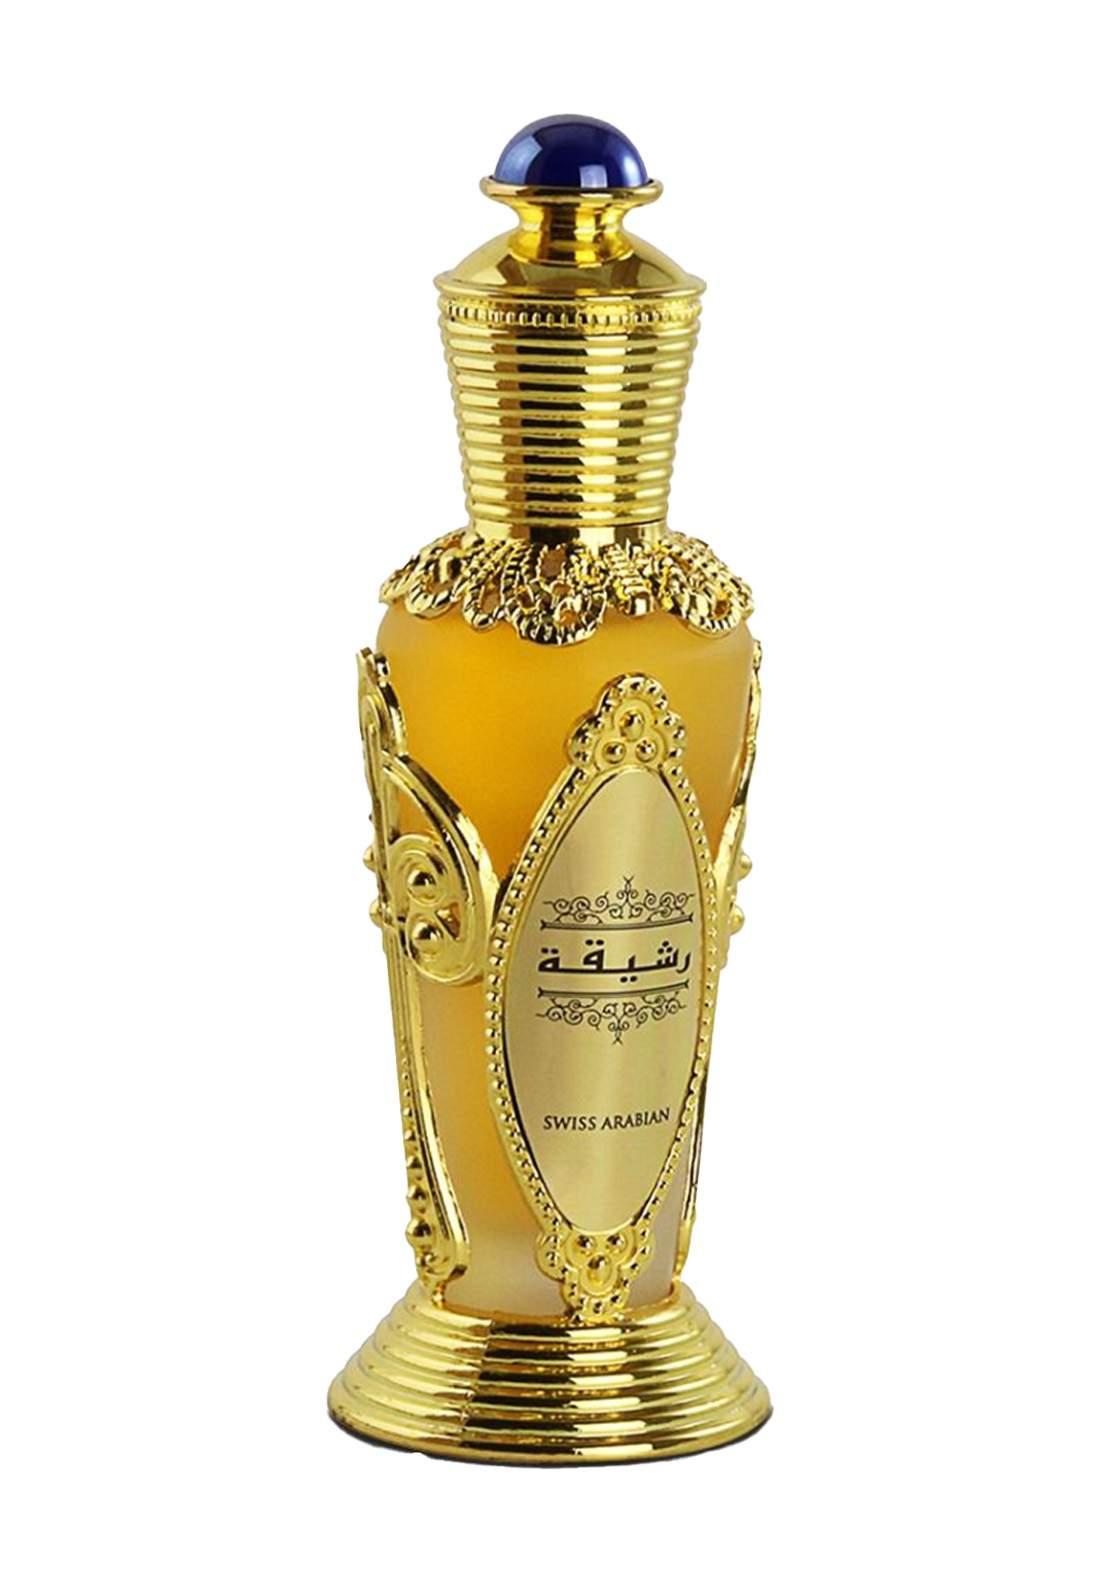 Swiss Arabian Rasheeqa 372 Concentrated Perfume Oil 20 ml عطر زيتي نسائي